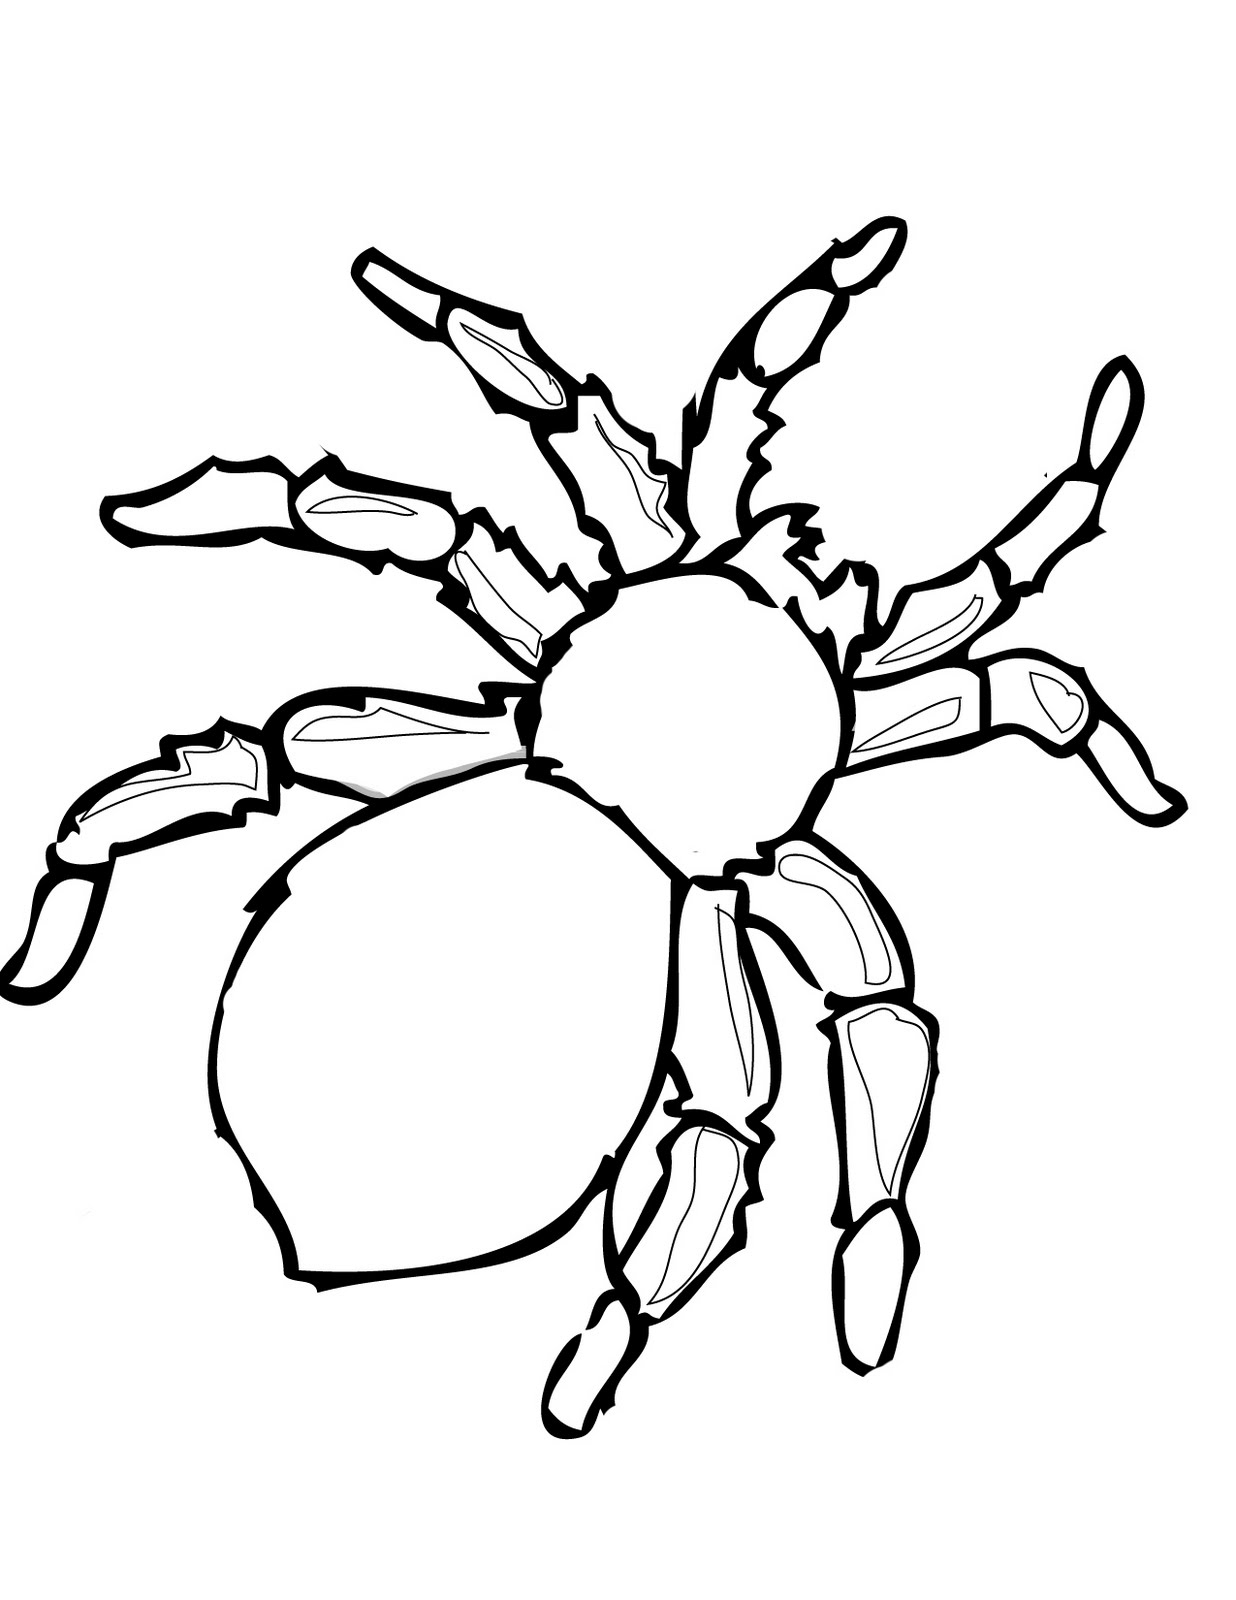 Spider Outline Printable